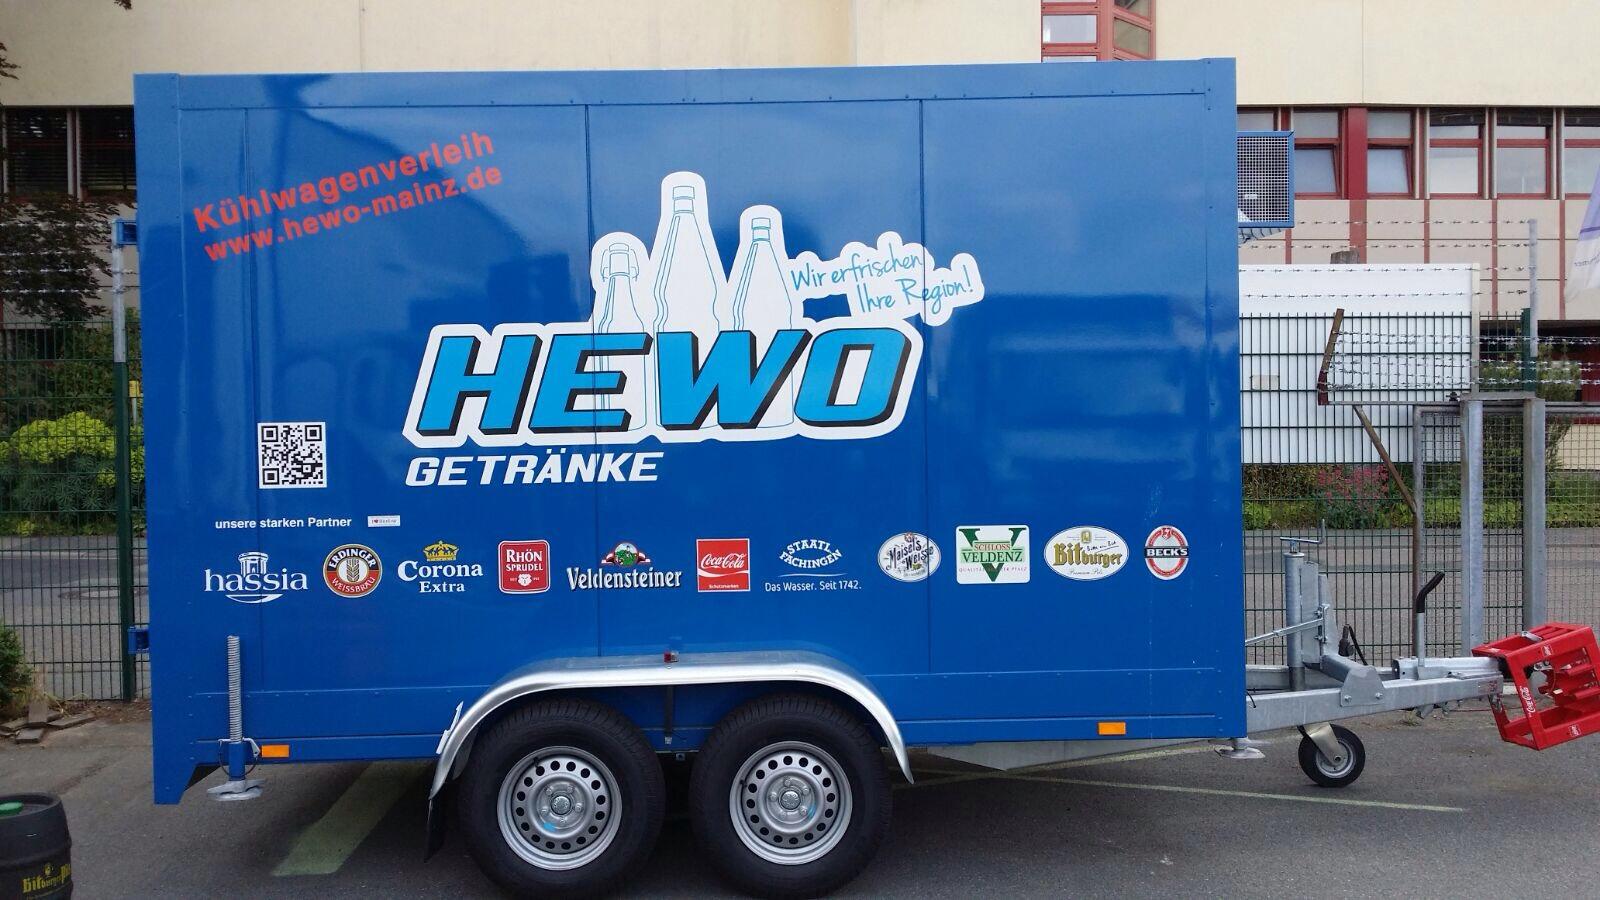 HEWO-Service-03